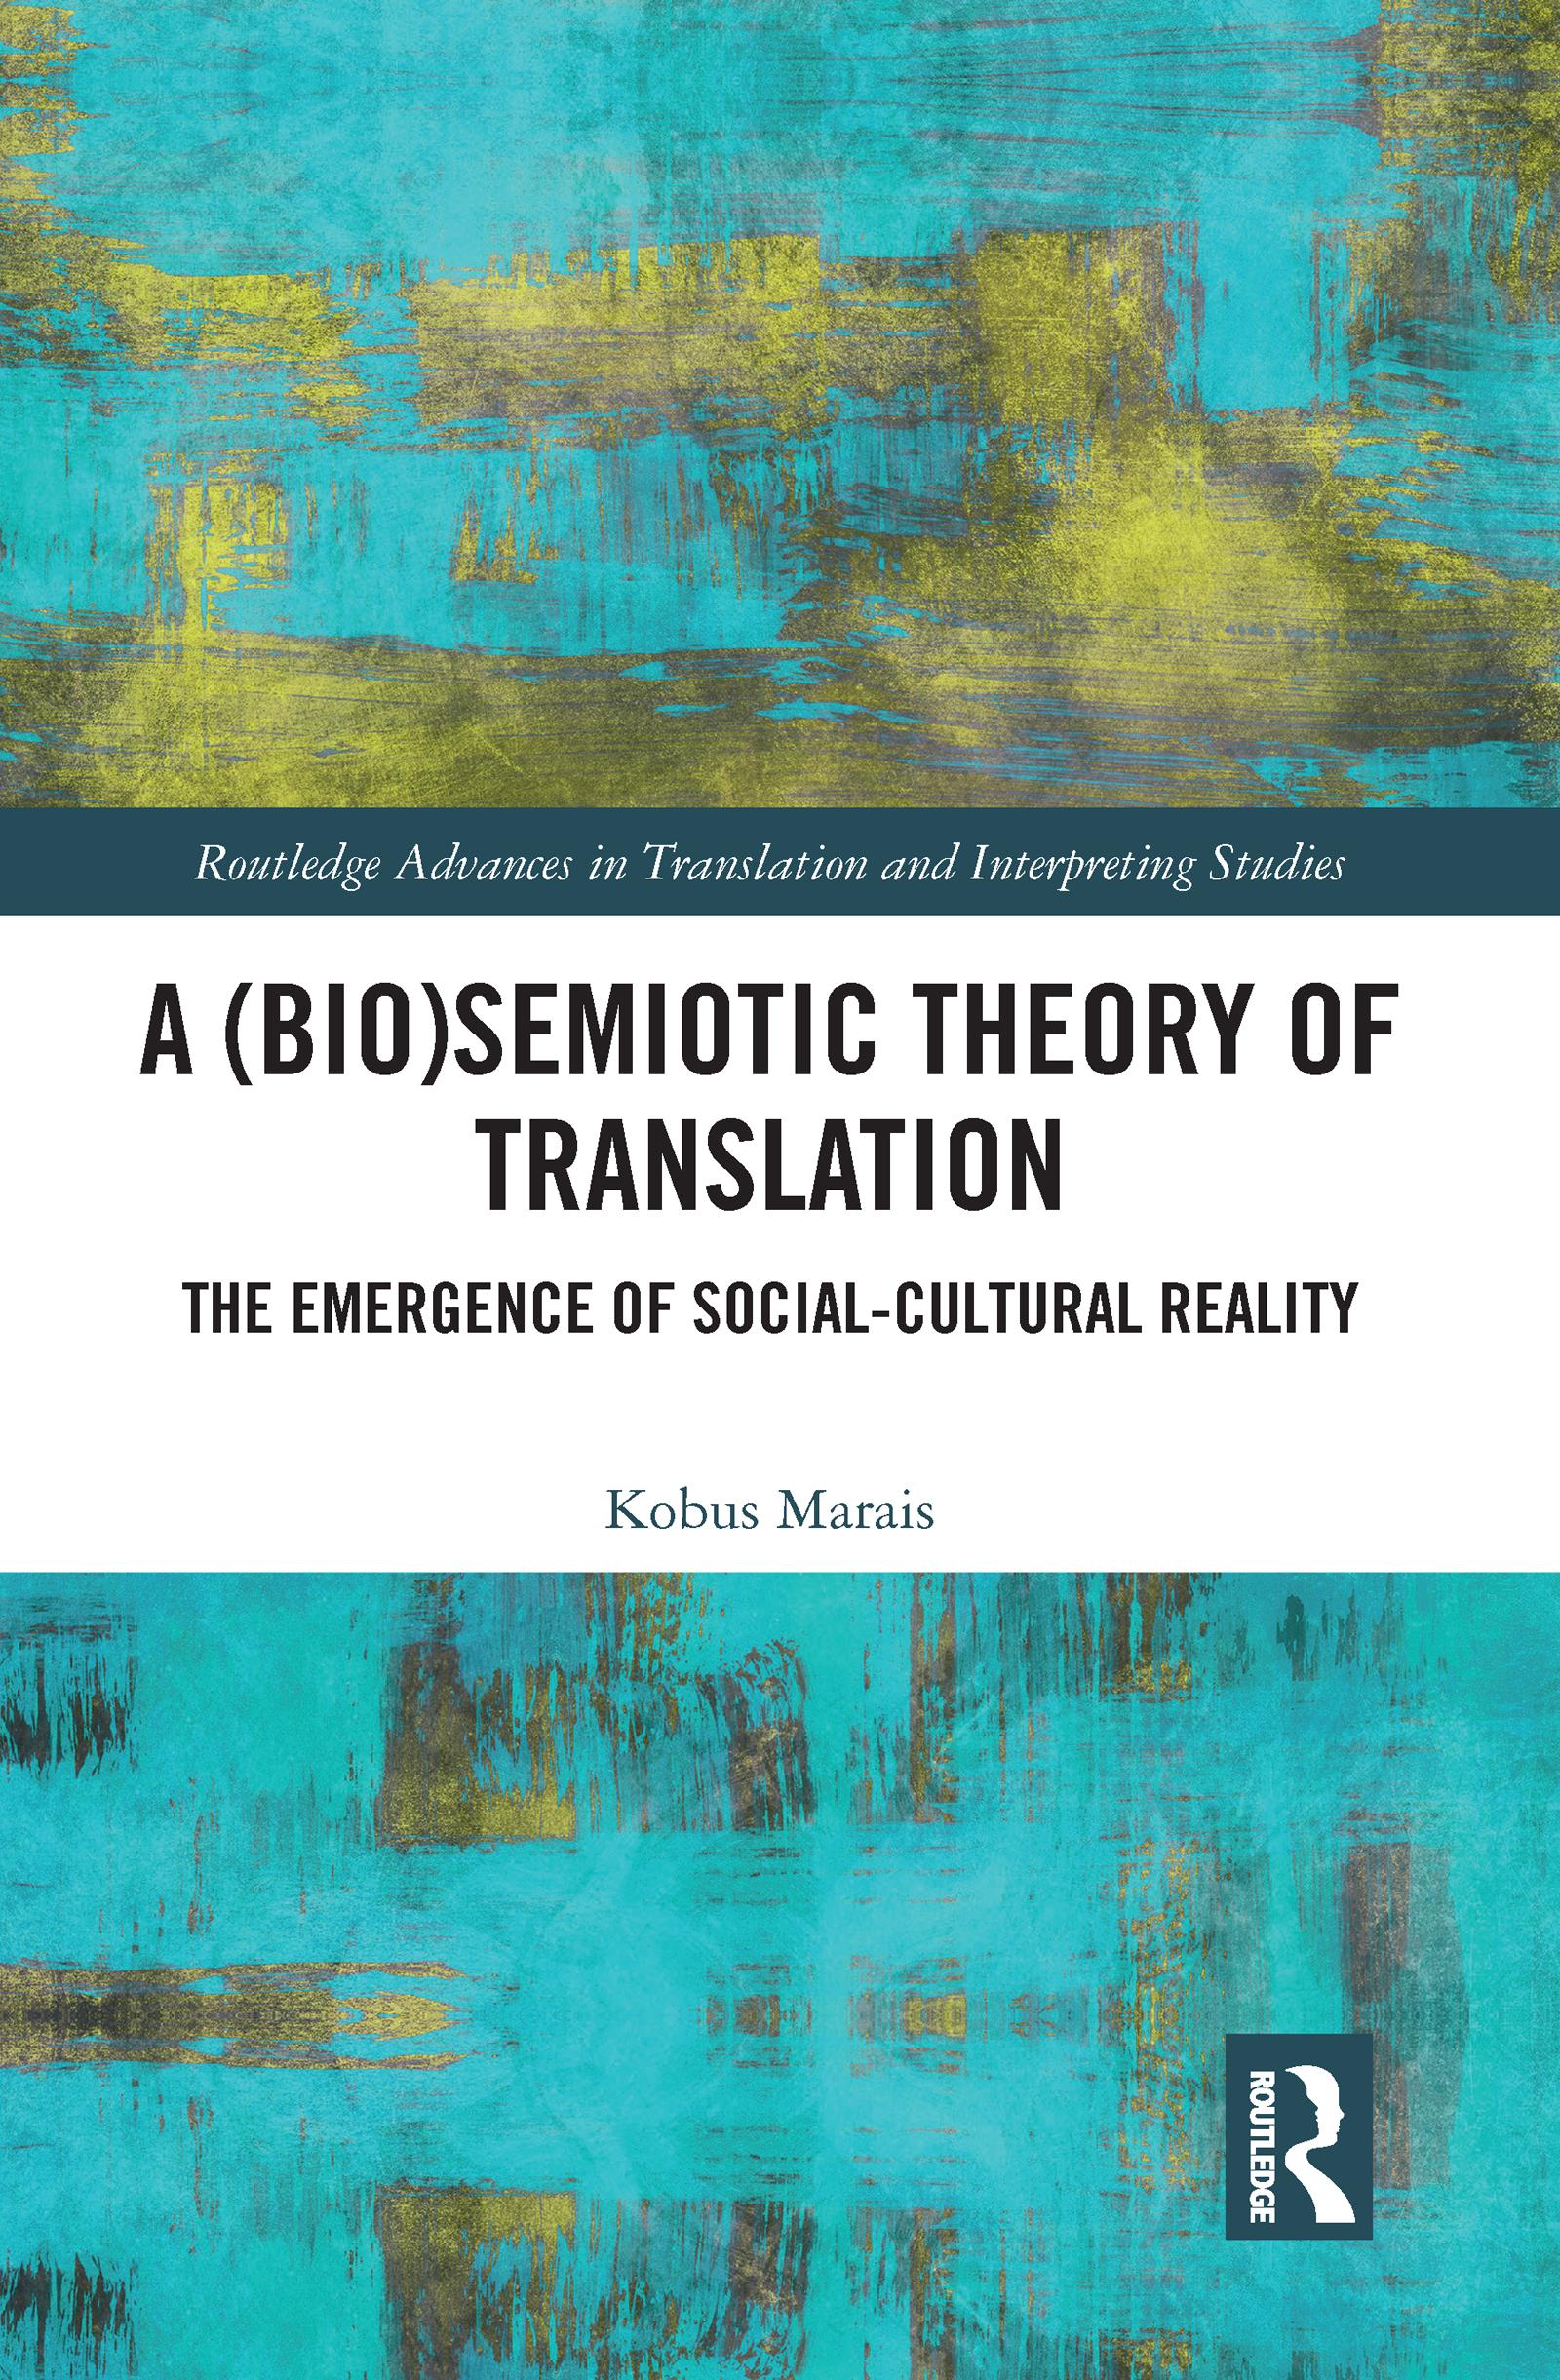 A (Bio)Semiotic Theory of Translation